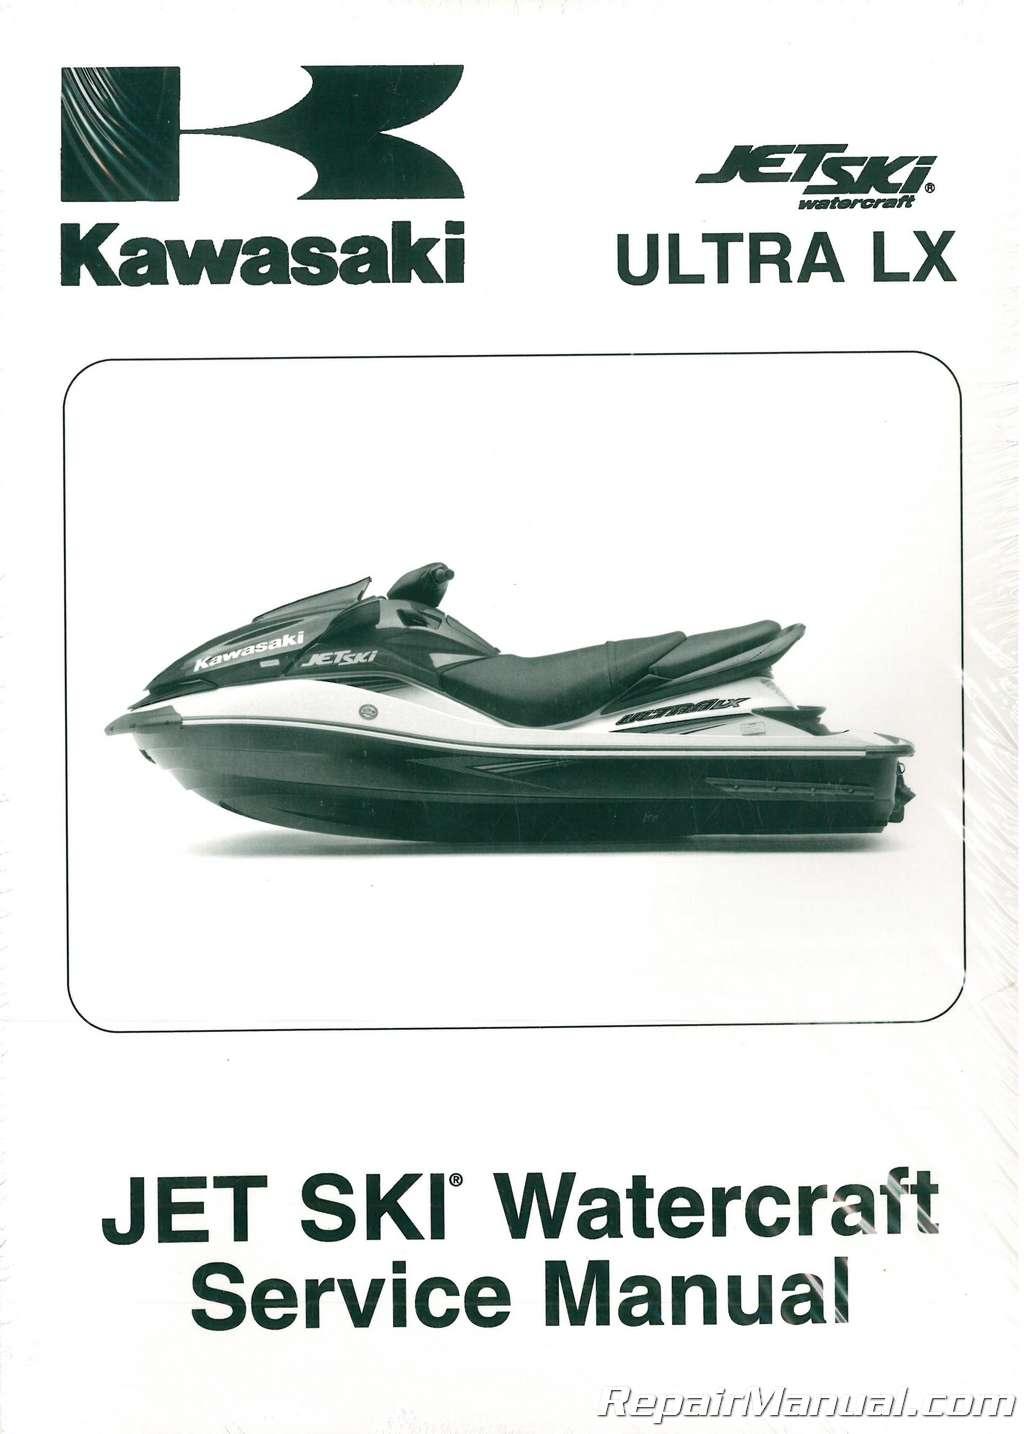 Kawasaki Personal Watercraft Manuals - Page 7 of 8 - Repair Manuals Online